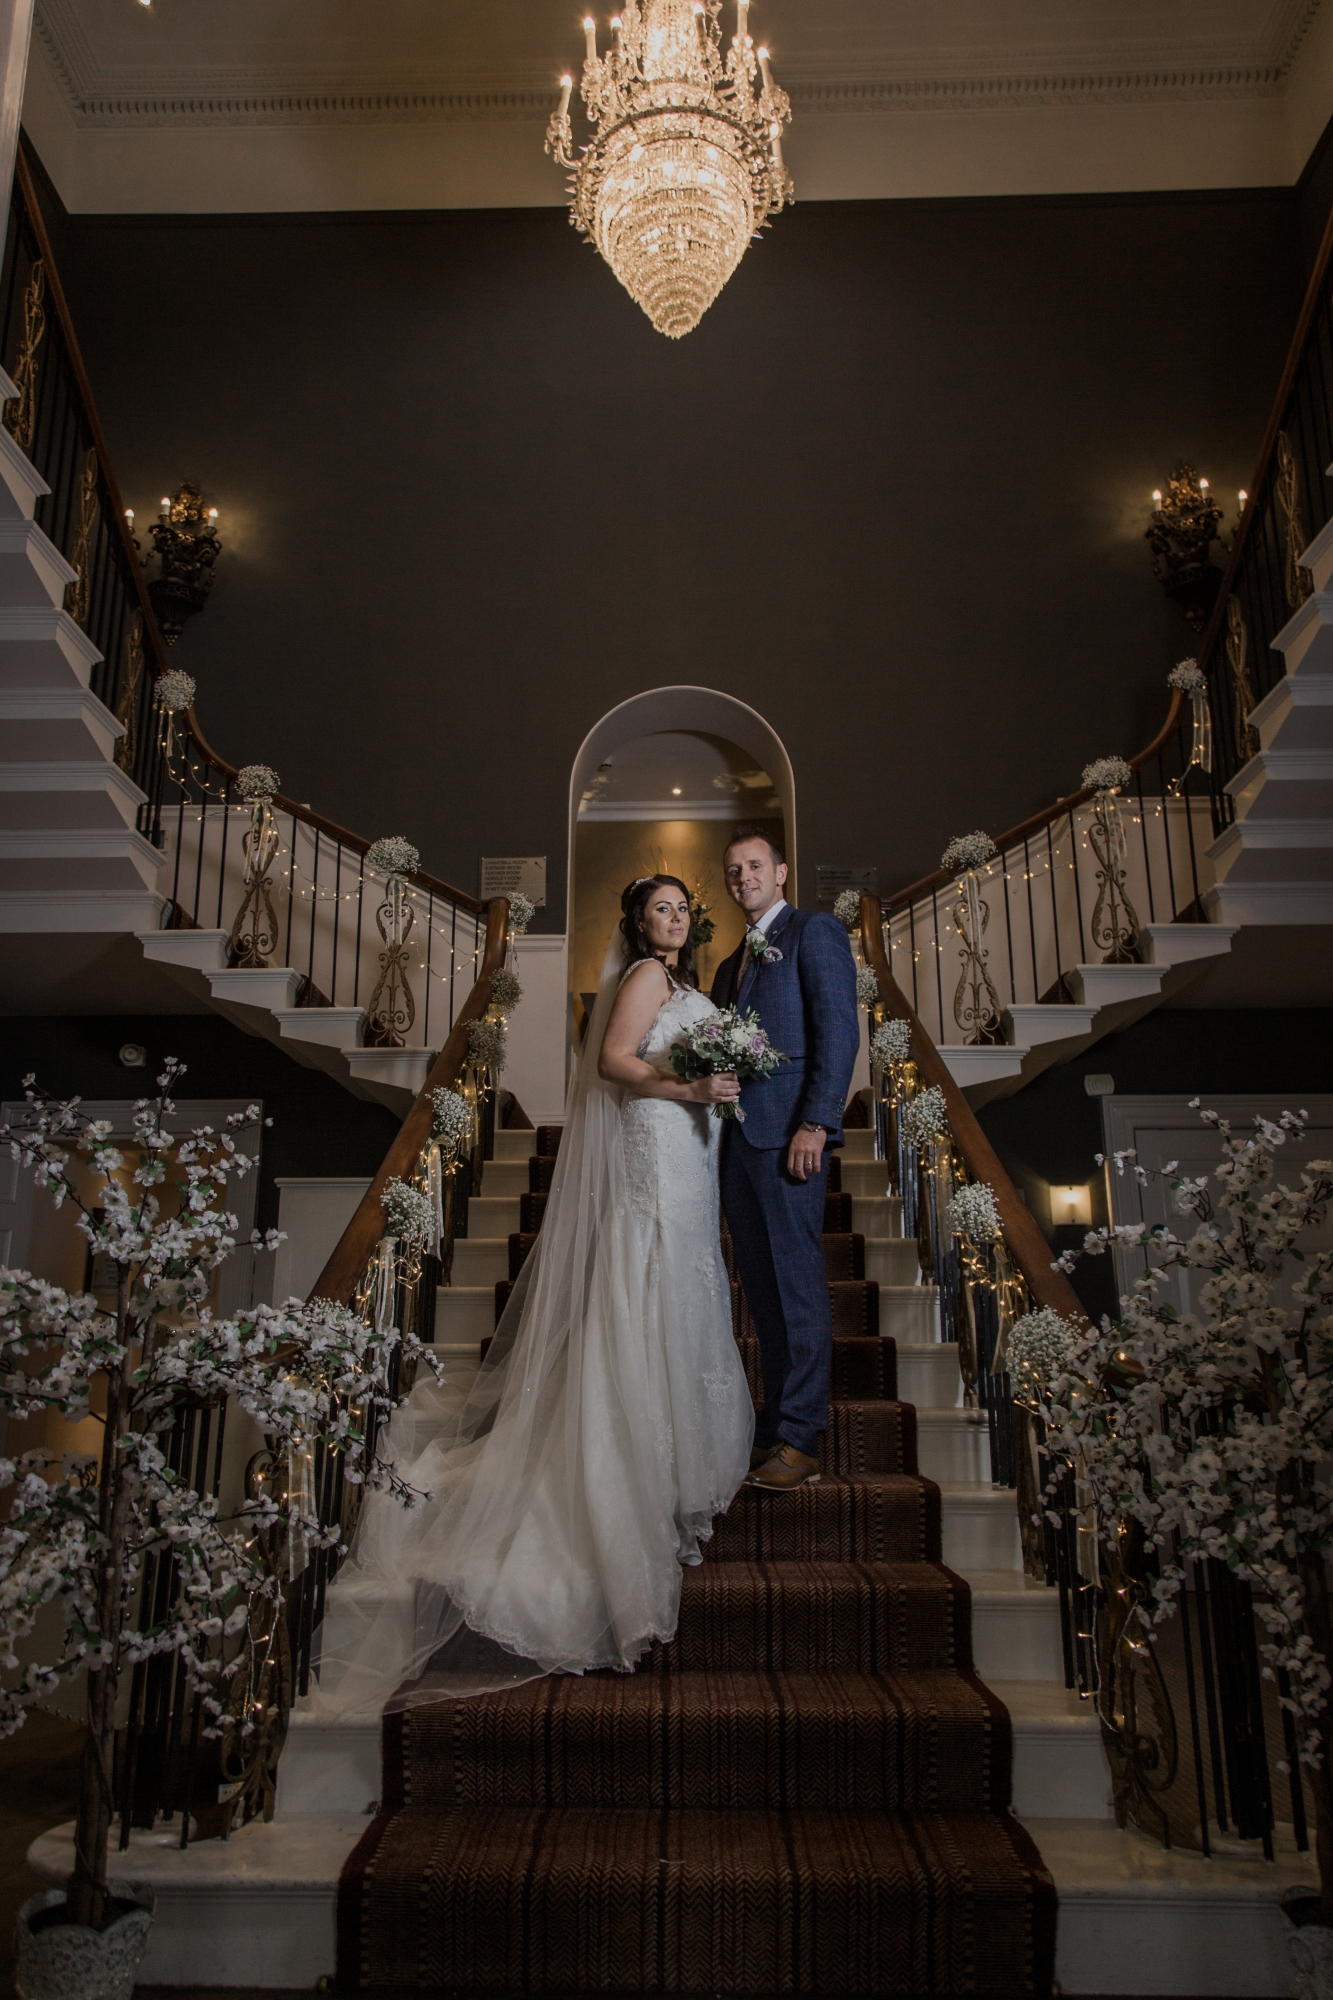 Mr & Mrs Lattimer - Our Wedding Day-350.jpg